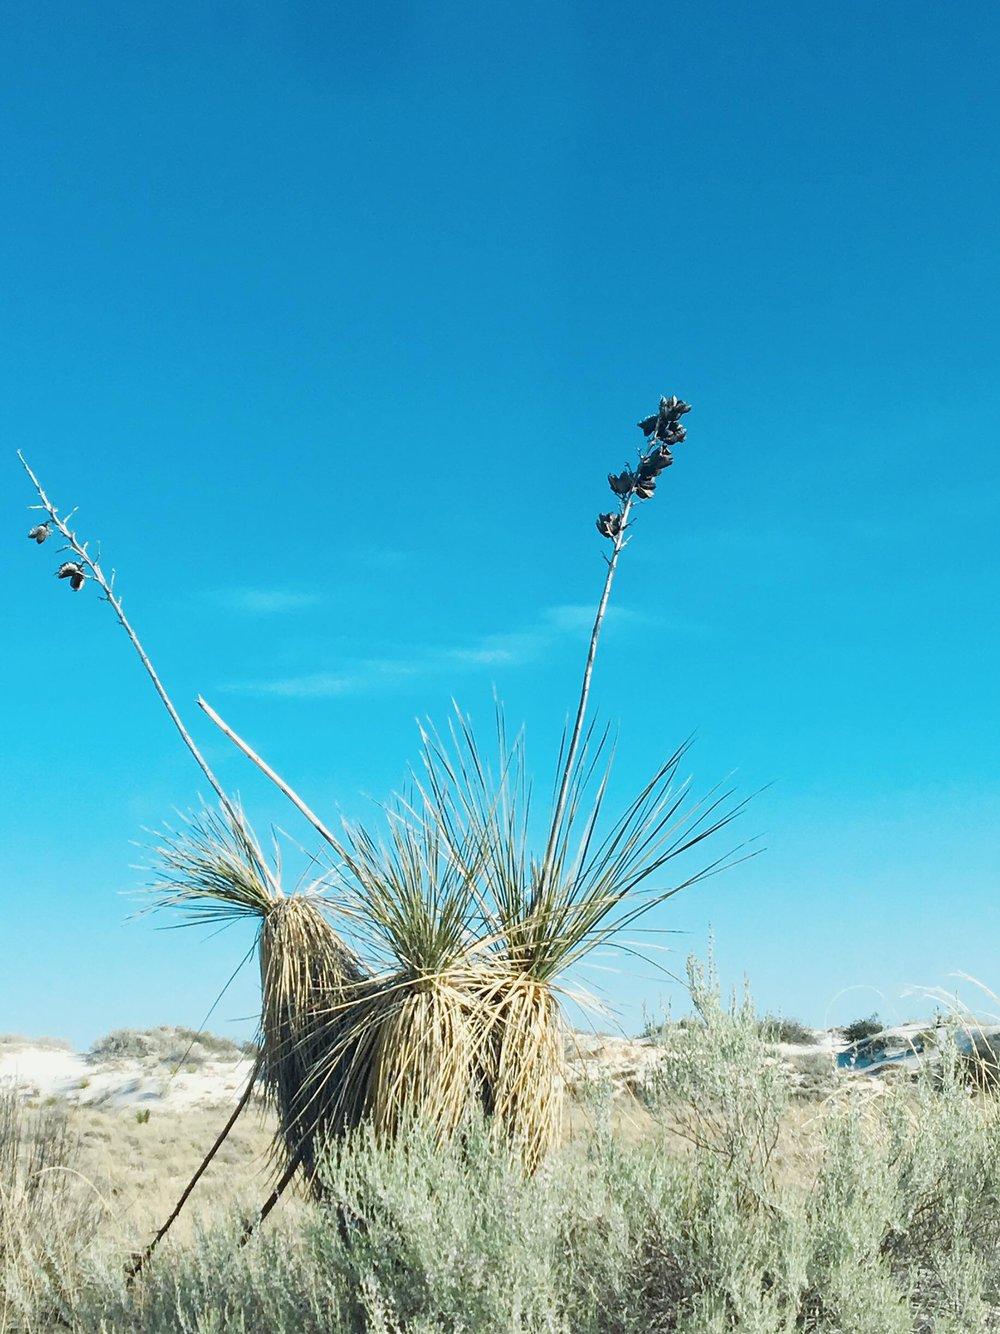 The Worlds Largest Gypsum Sandbox | Vegitation | jumpseatjenny | New Mexico